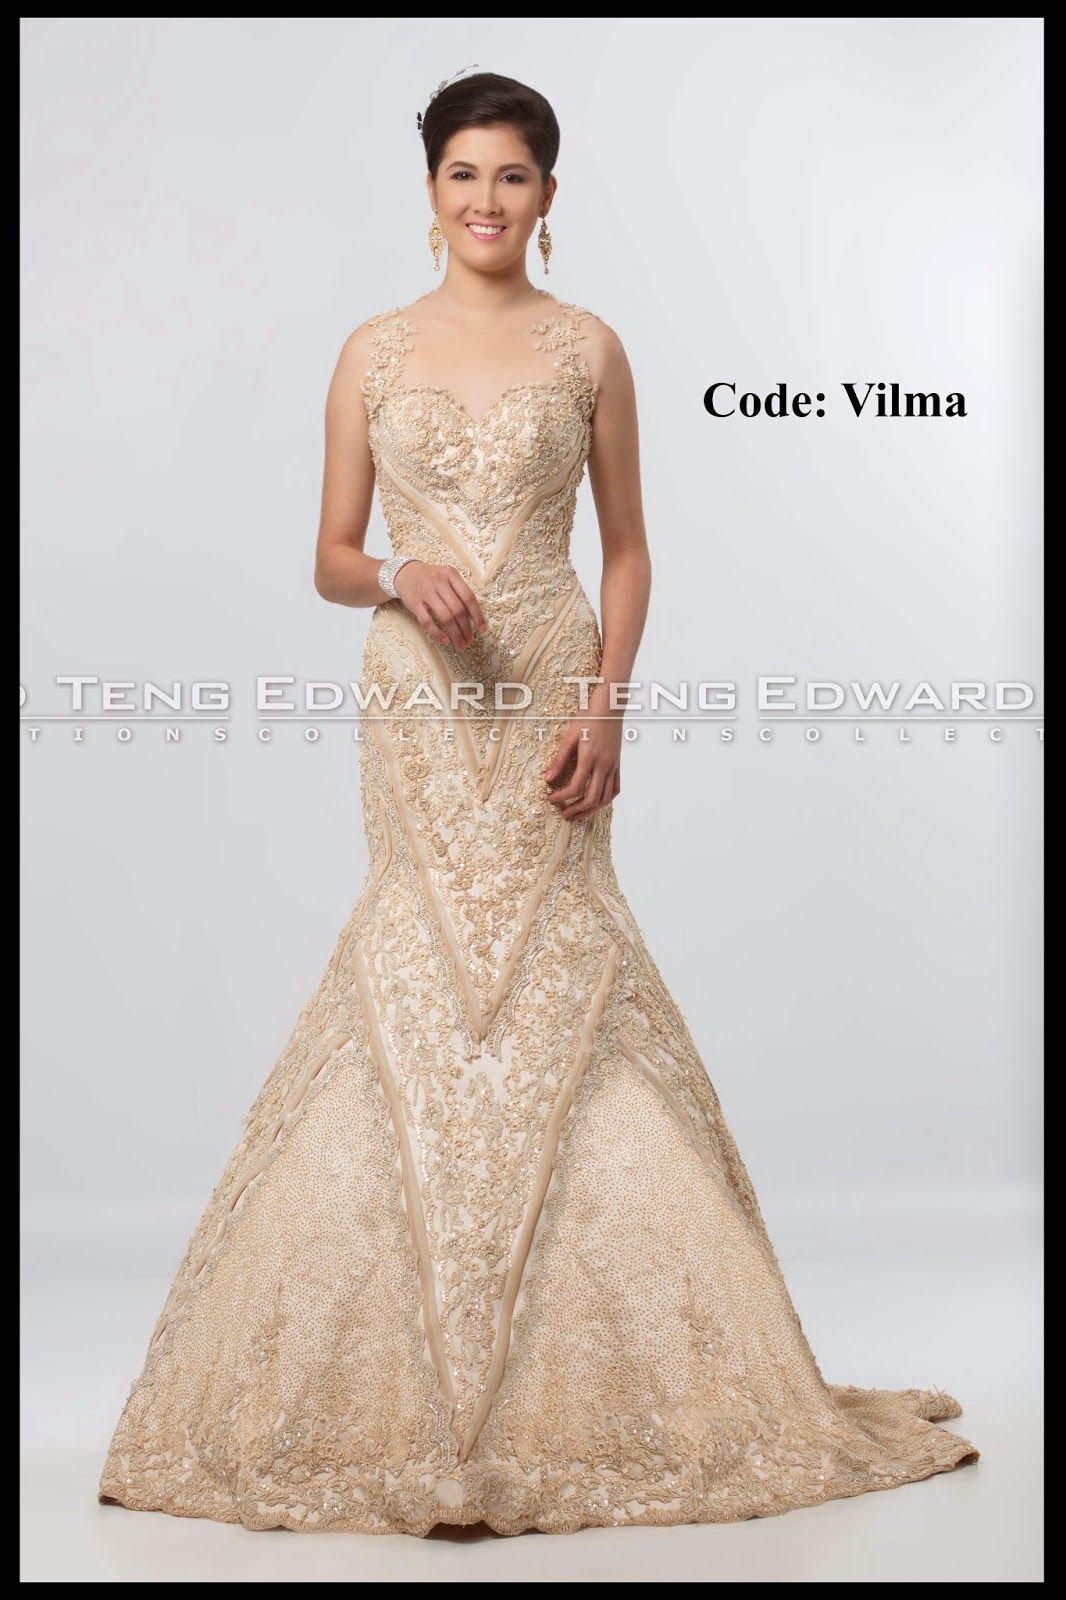 Edward Teng - Philippine Bridal Gowns | Bridal | Pinterest ...